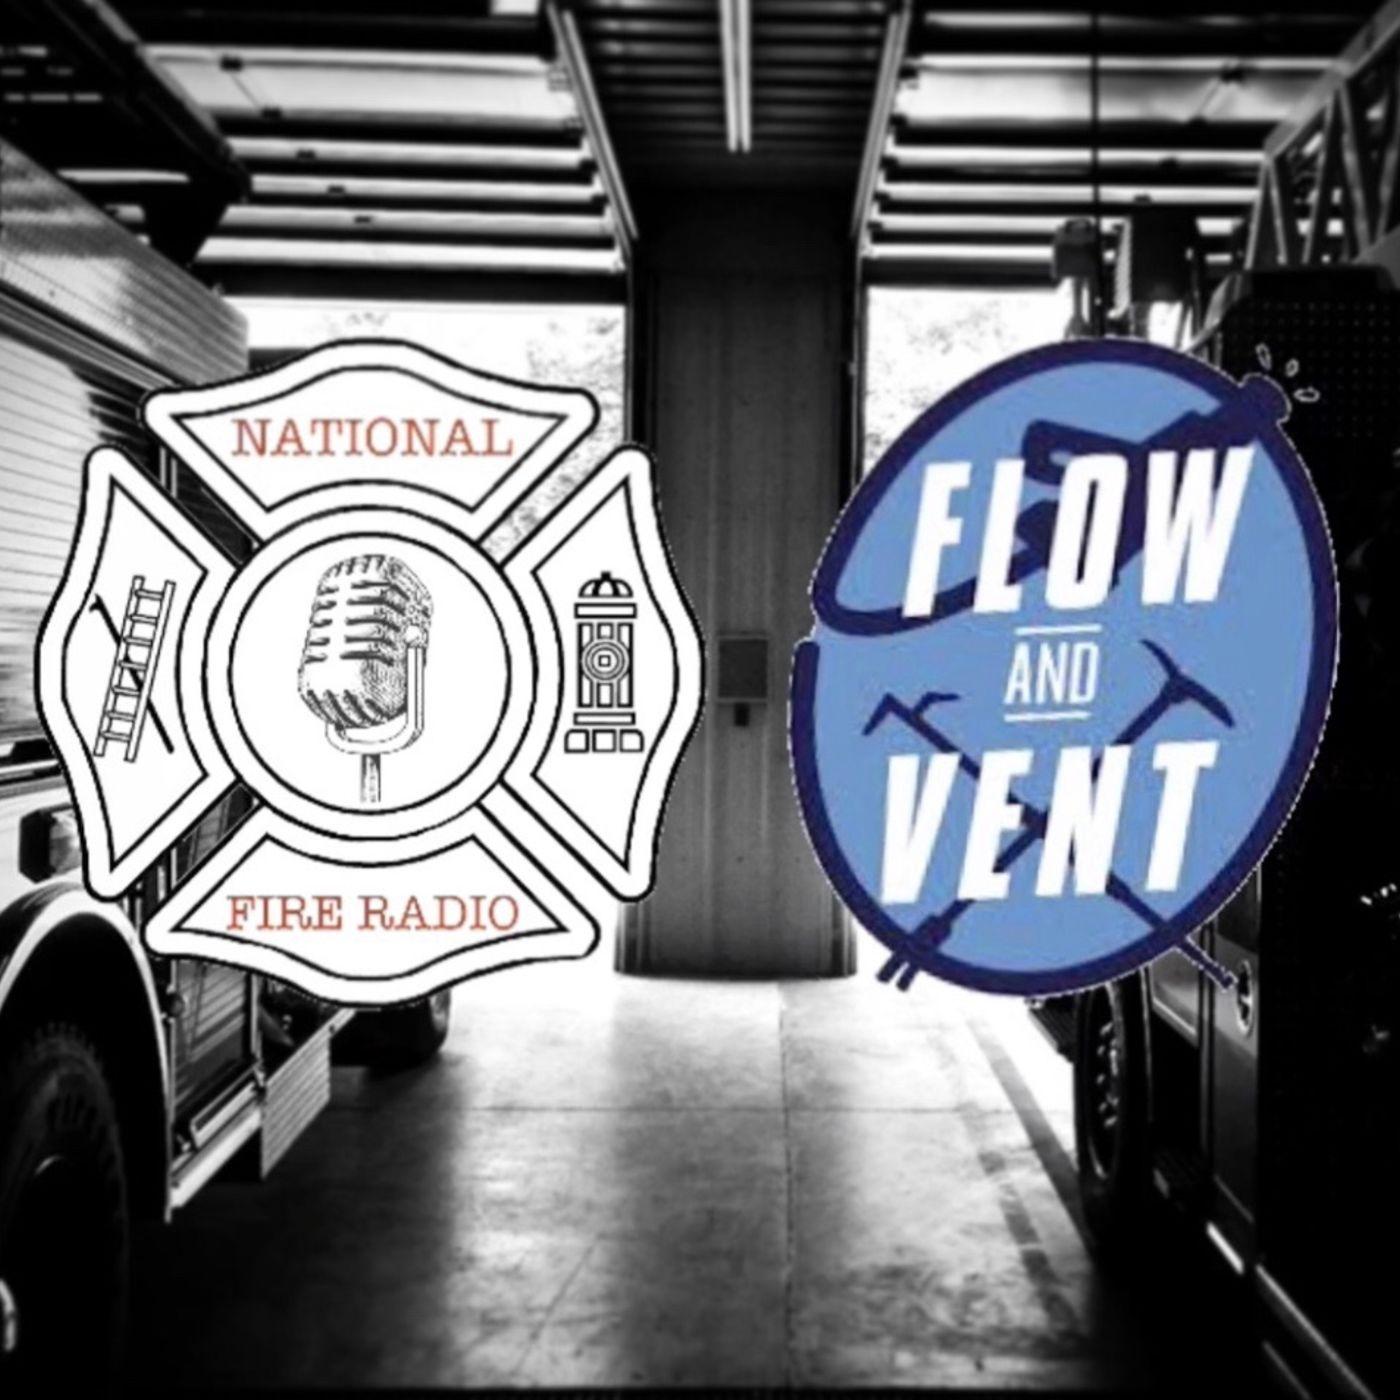 Episode 19 - National Fire Radio*